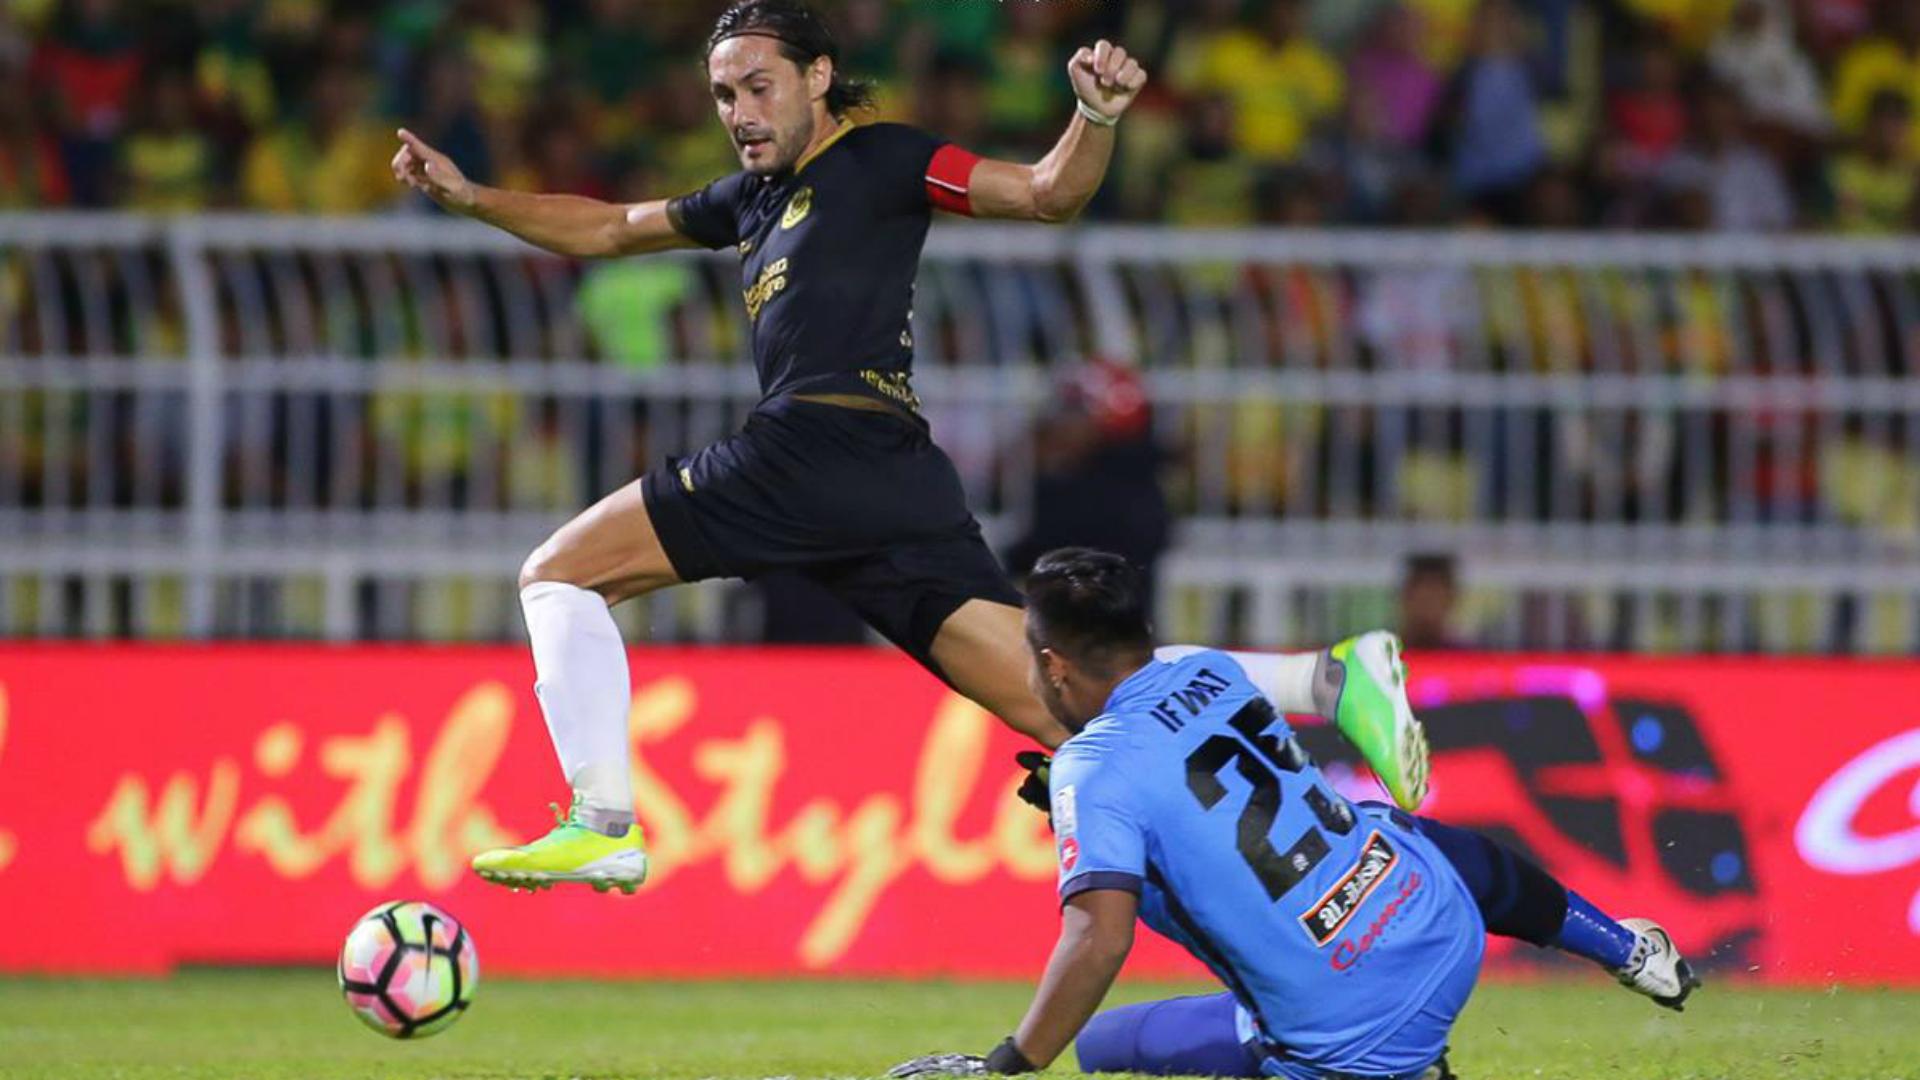 Issey Nakajima, Terengganu, Ifwat Akmal, Kedah, FA Cup, 30/04/2017